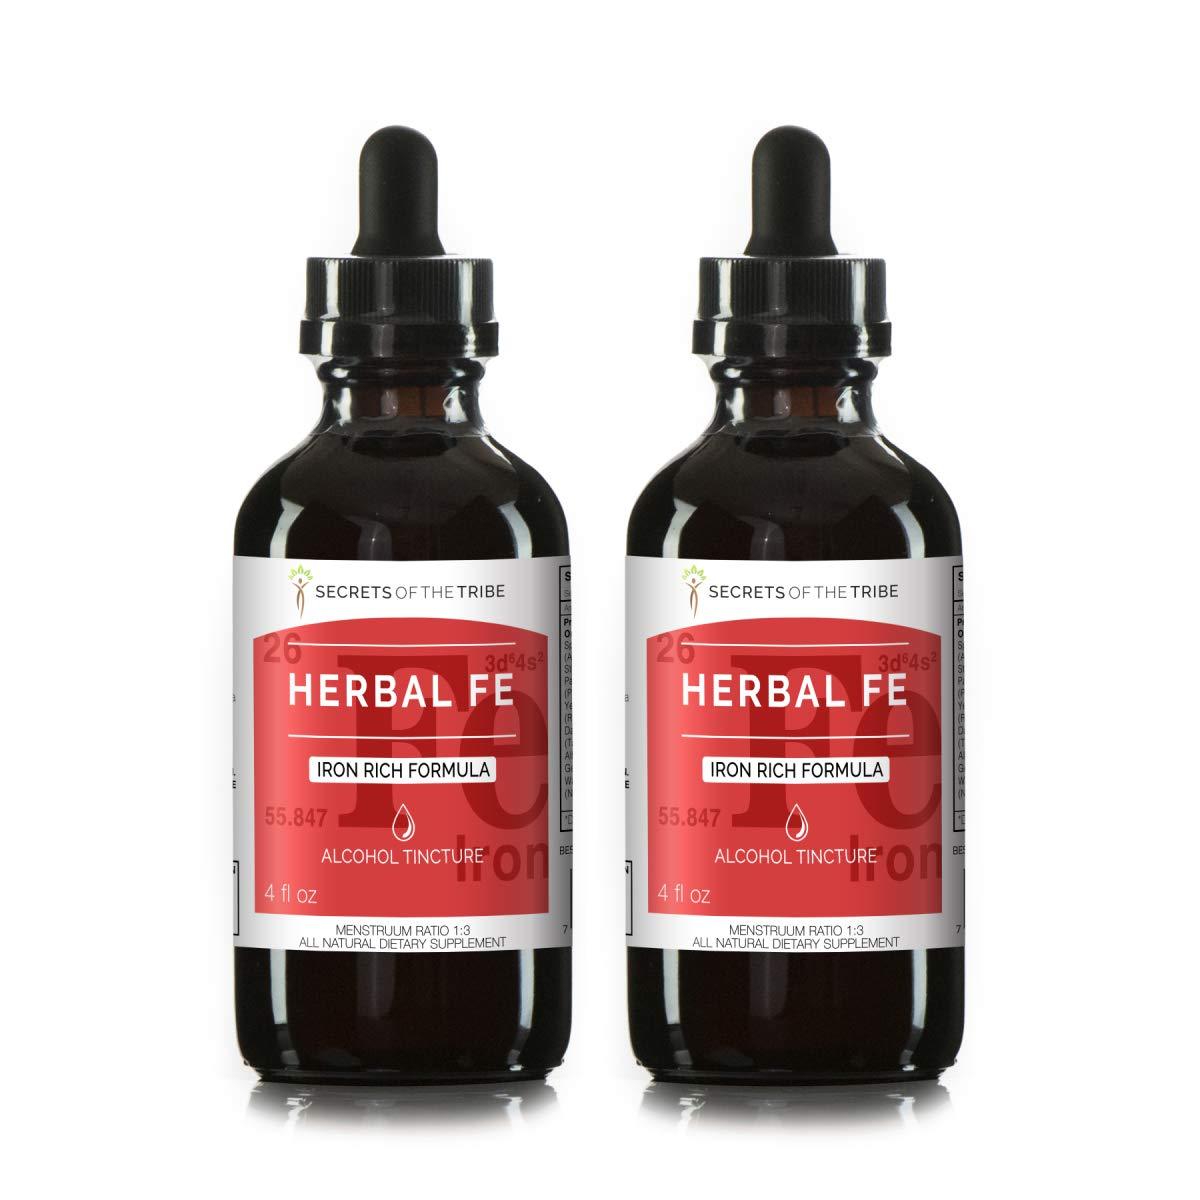 Herbal Fe, Glycerite Spirulina, Stinging Nettle, Parsley, Yellow Dock, Dandelion, Alfalfa, Gentian, Watercress. Iron Rich Formula (2x4 fl oz)